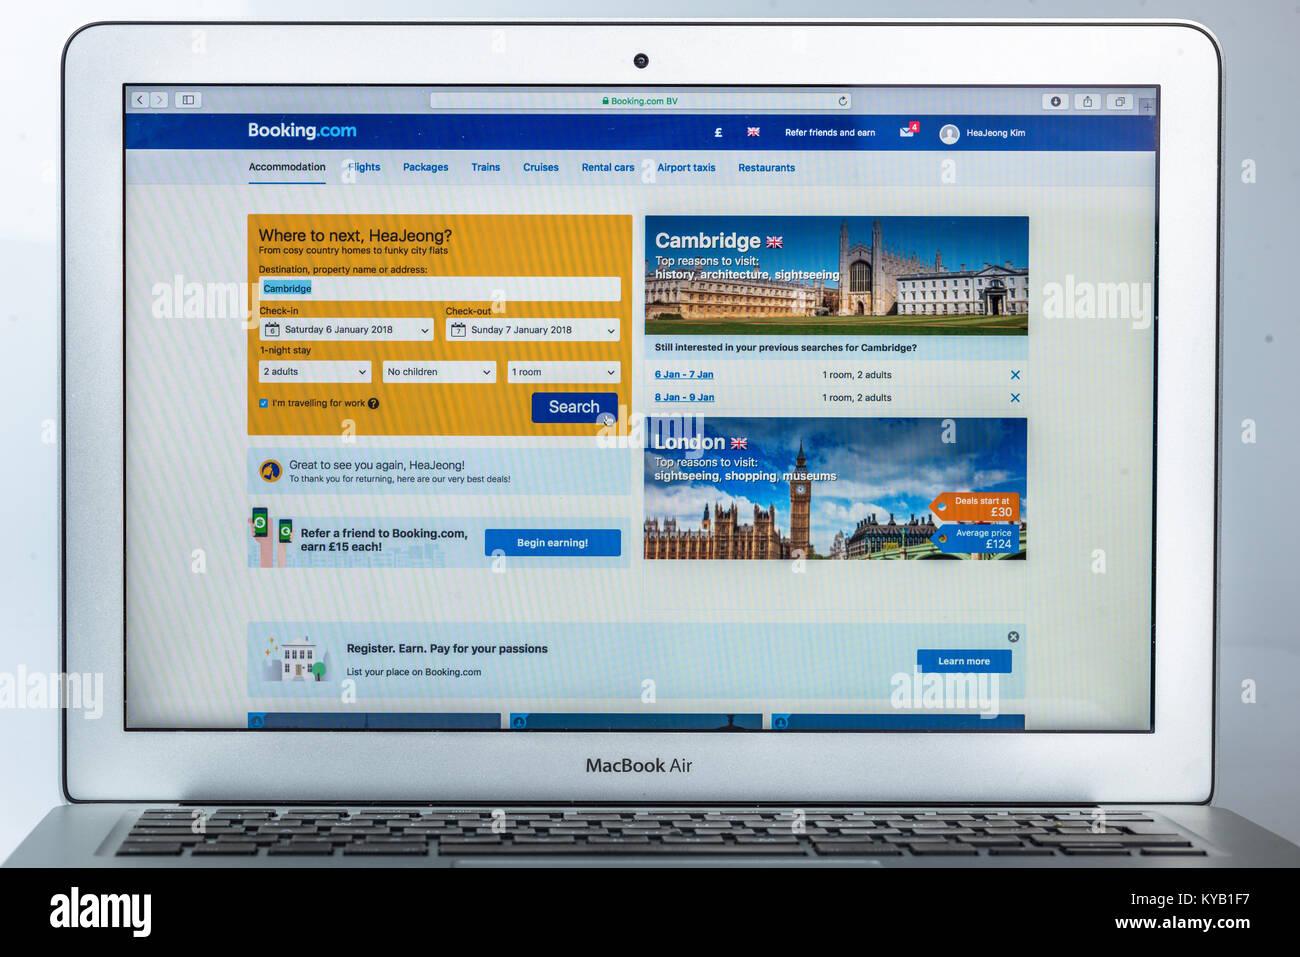 Booking.com website - Stock Image